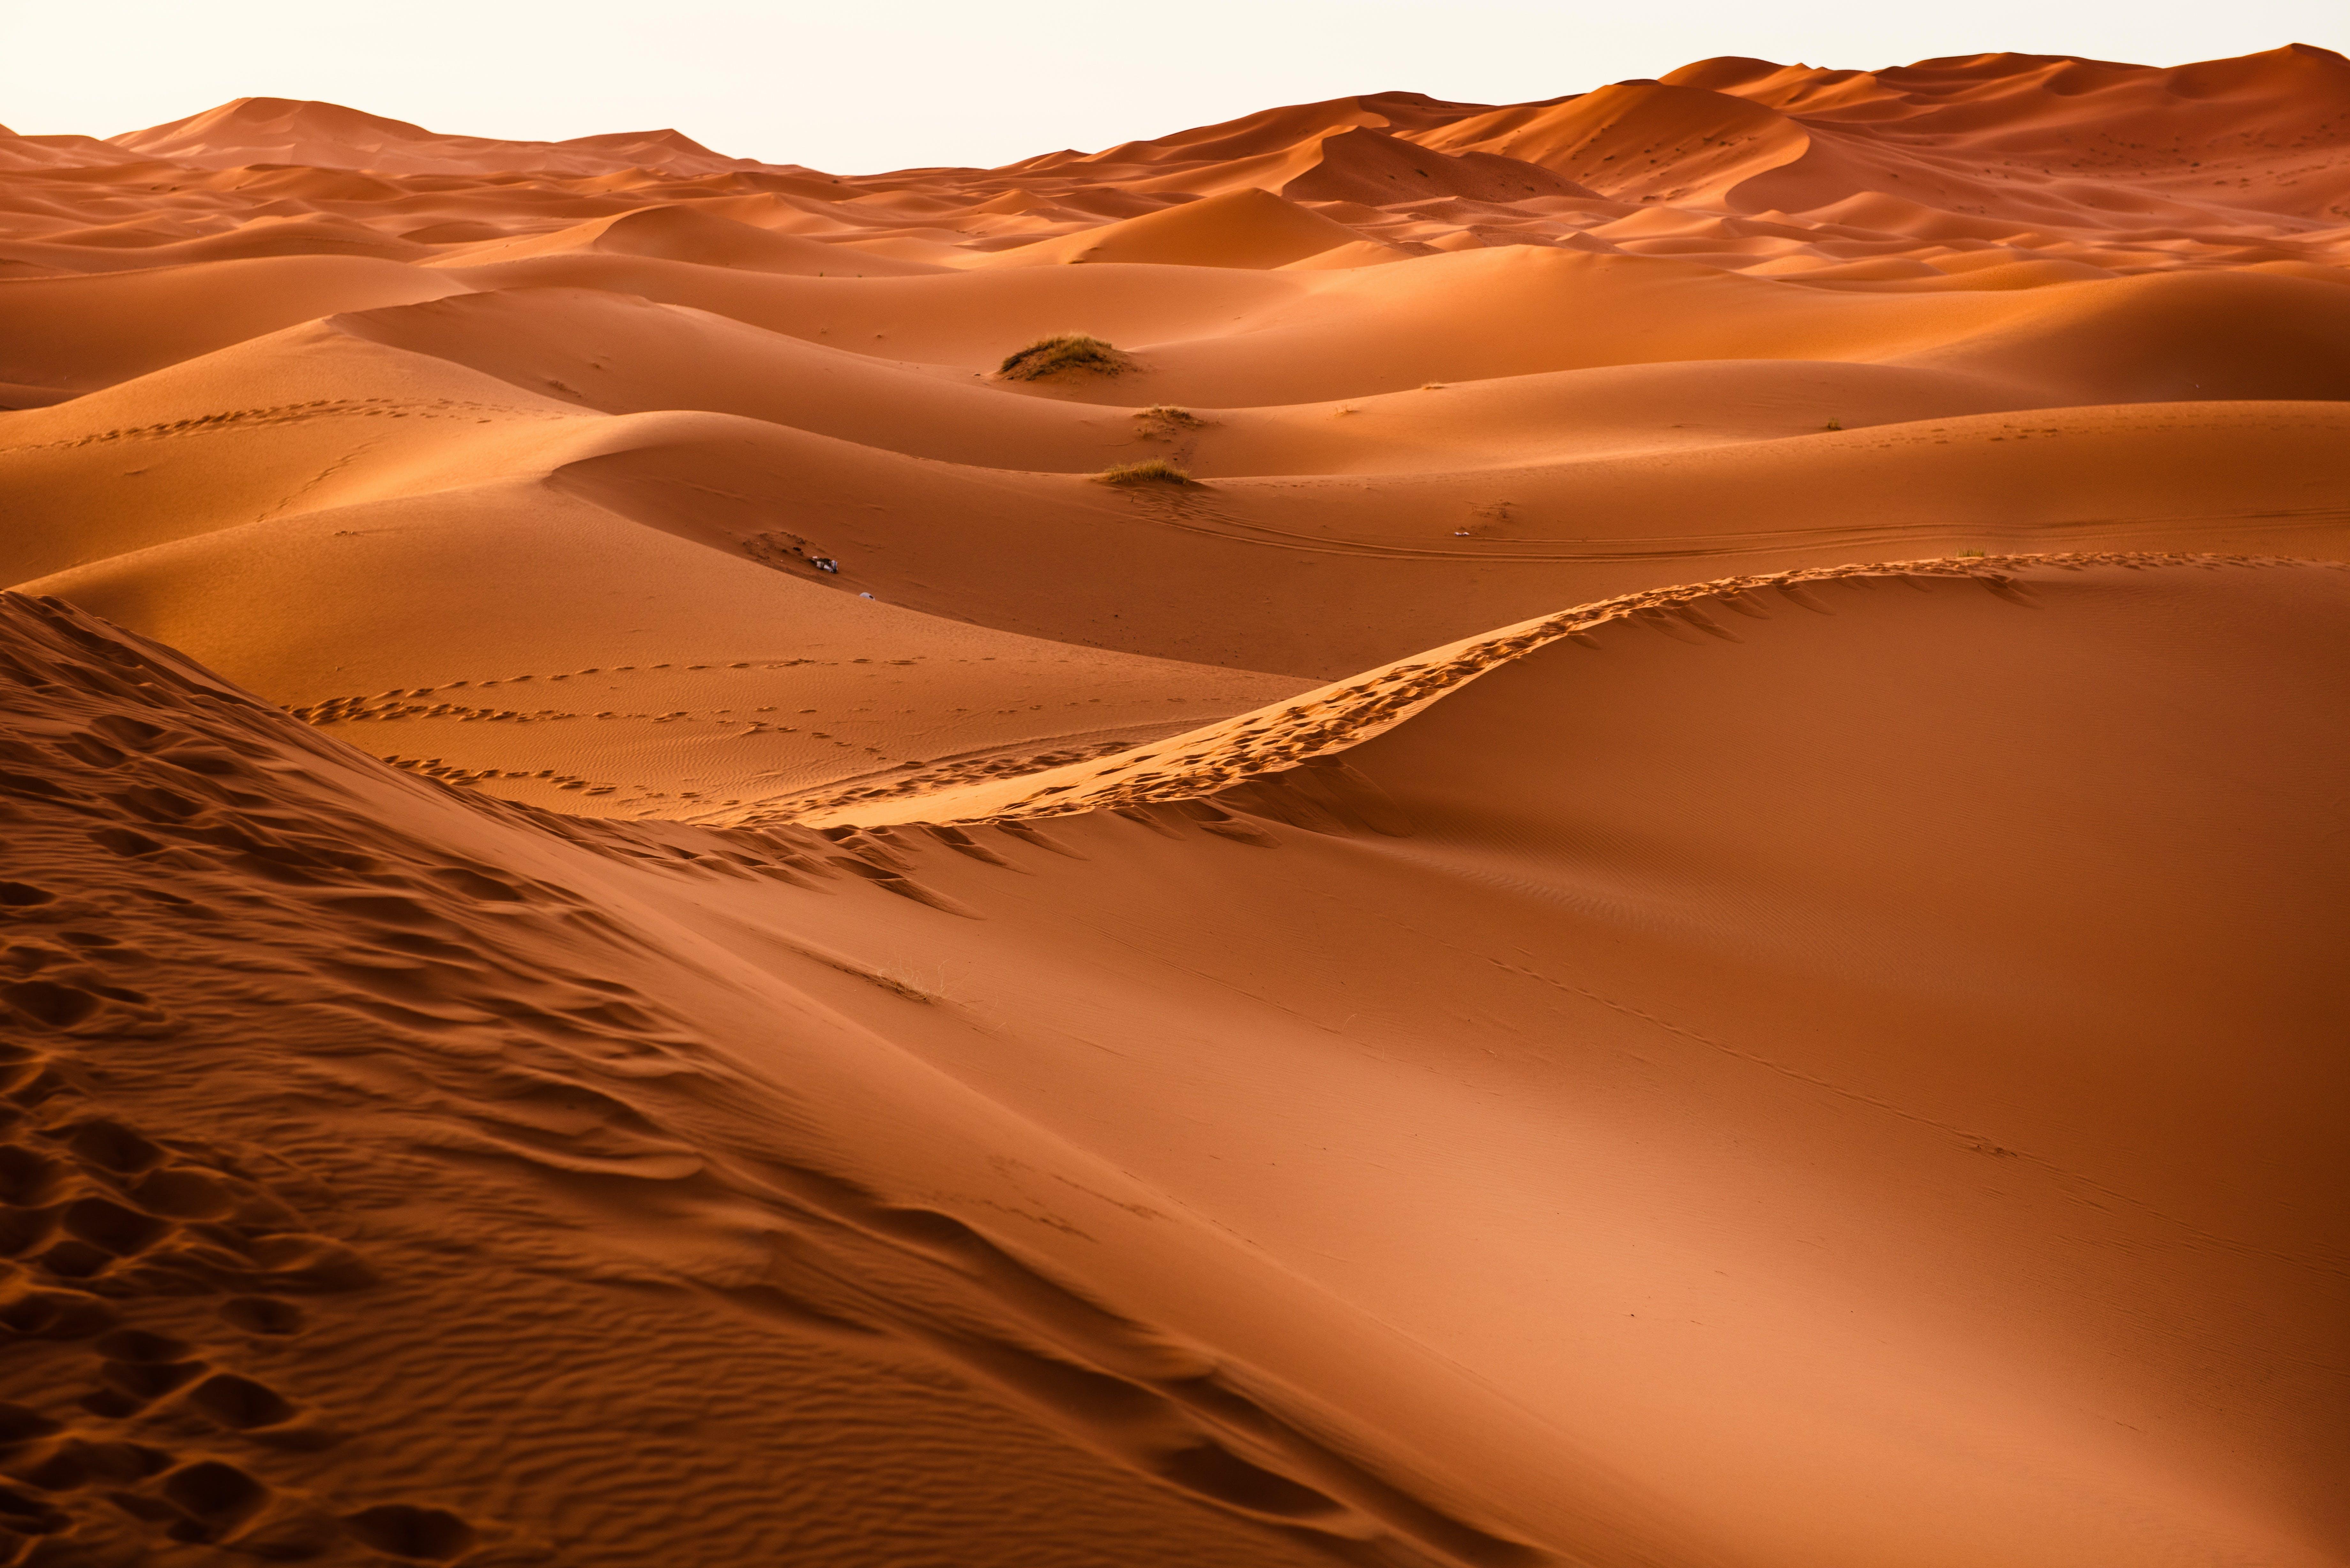 барханы пустыня дюны  № 1291891 без смс